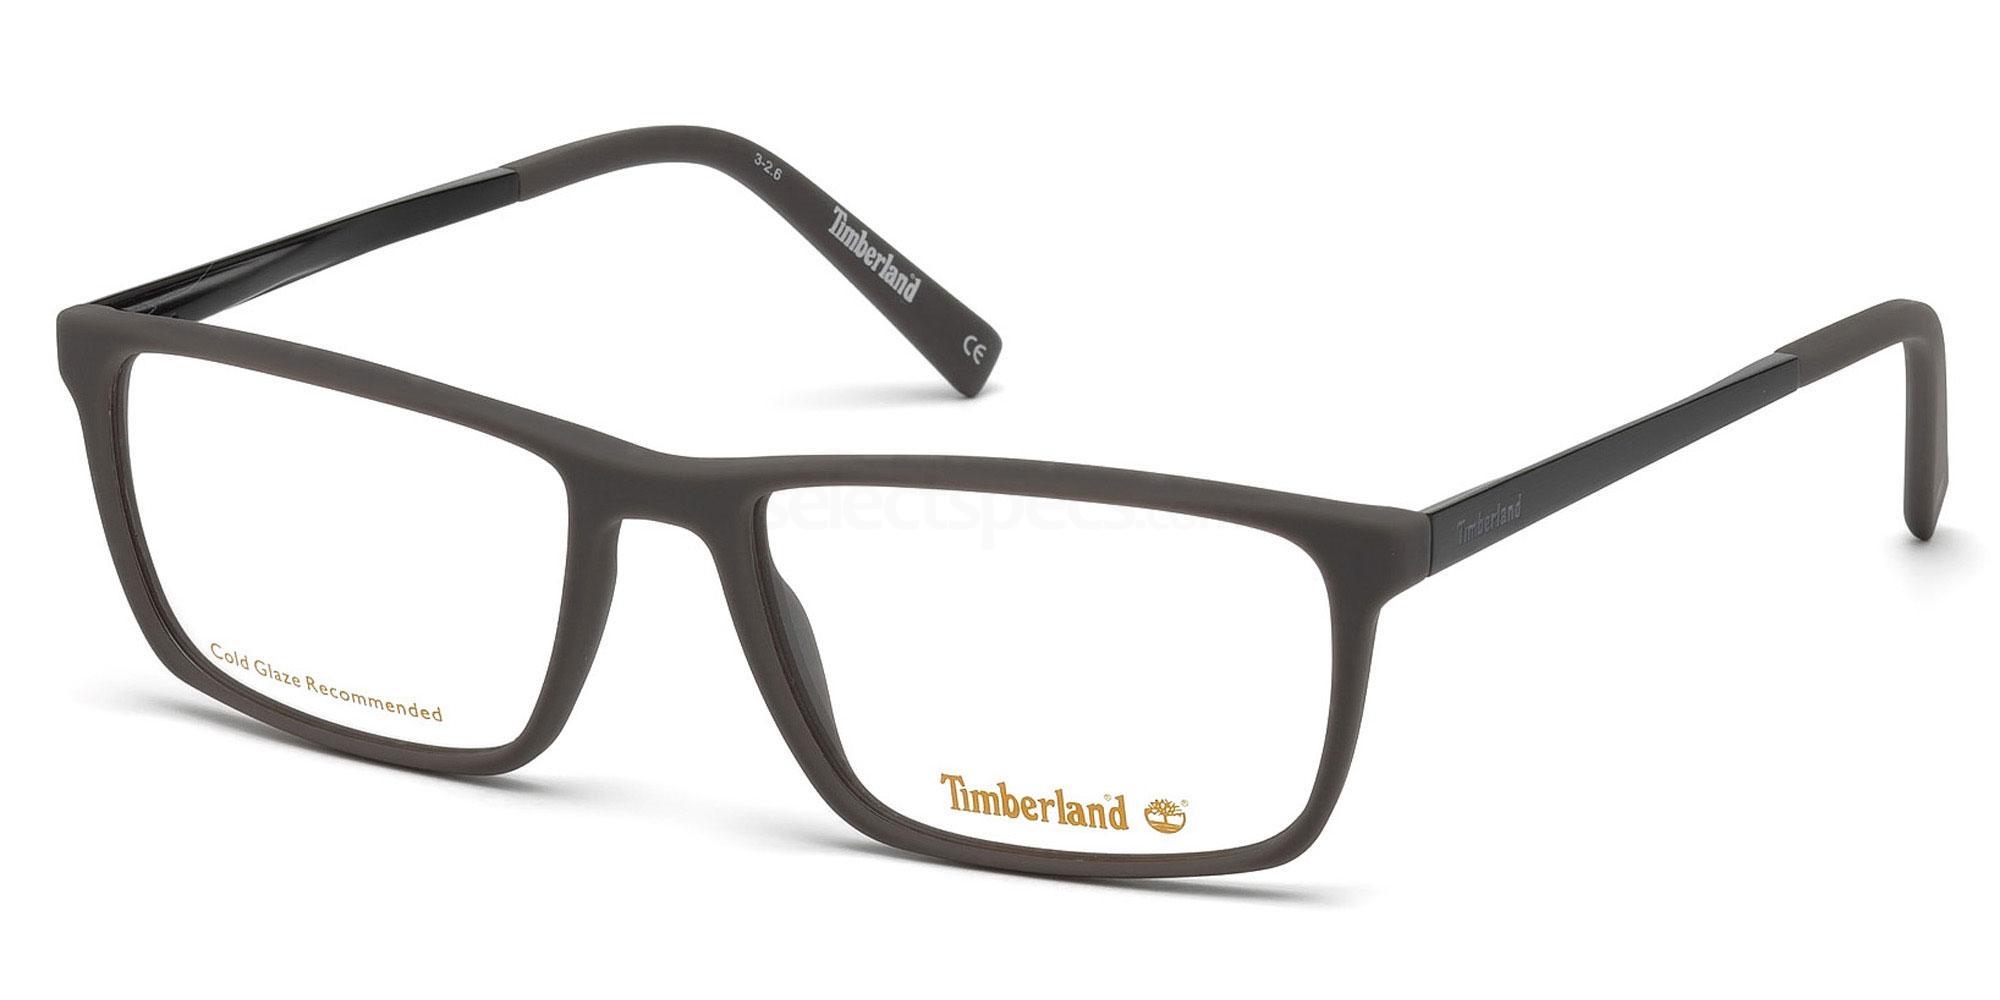 020 TB1562 Glasses, Timberland